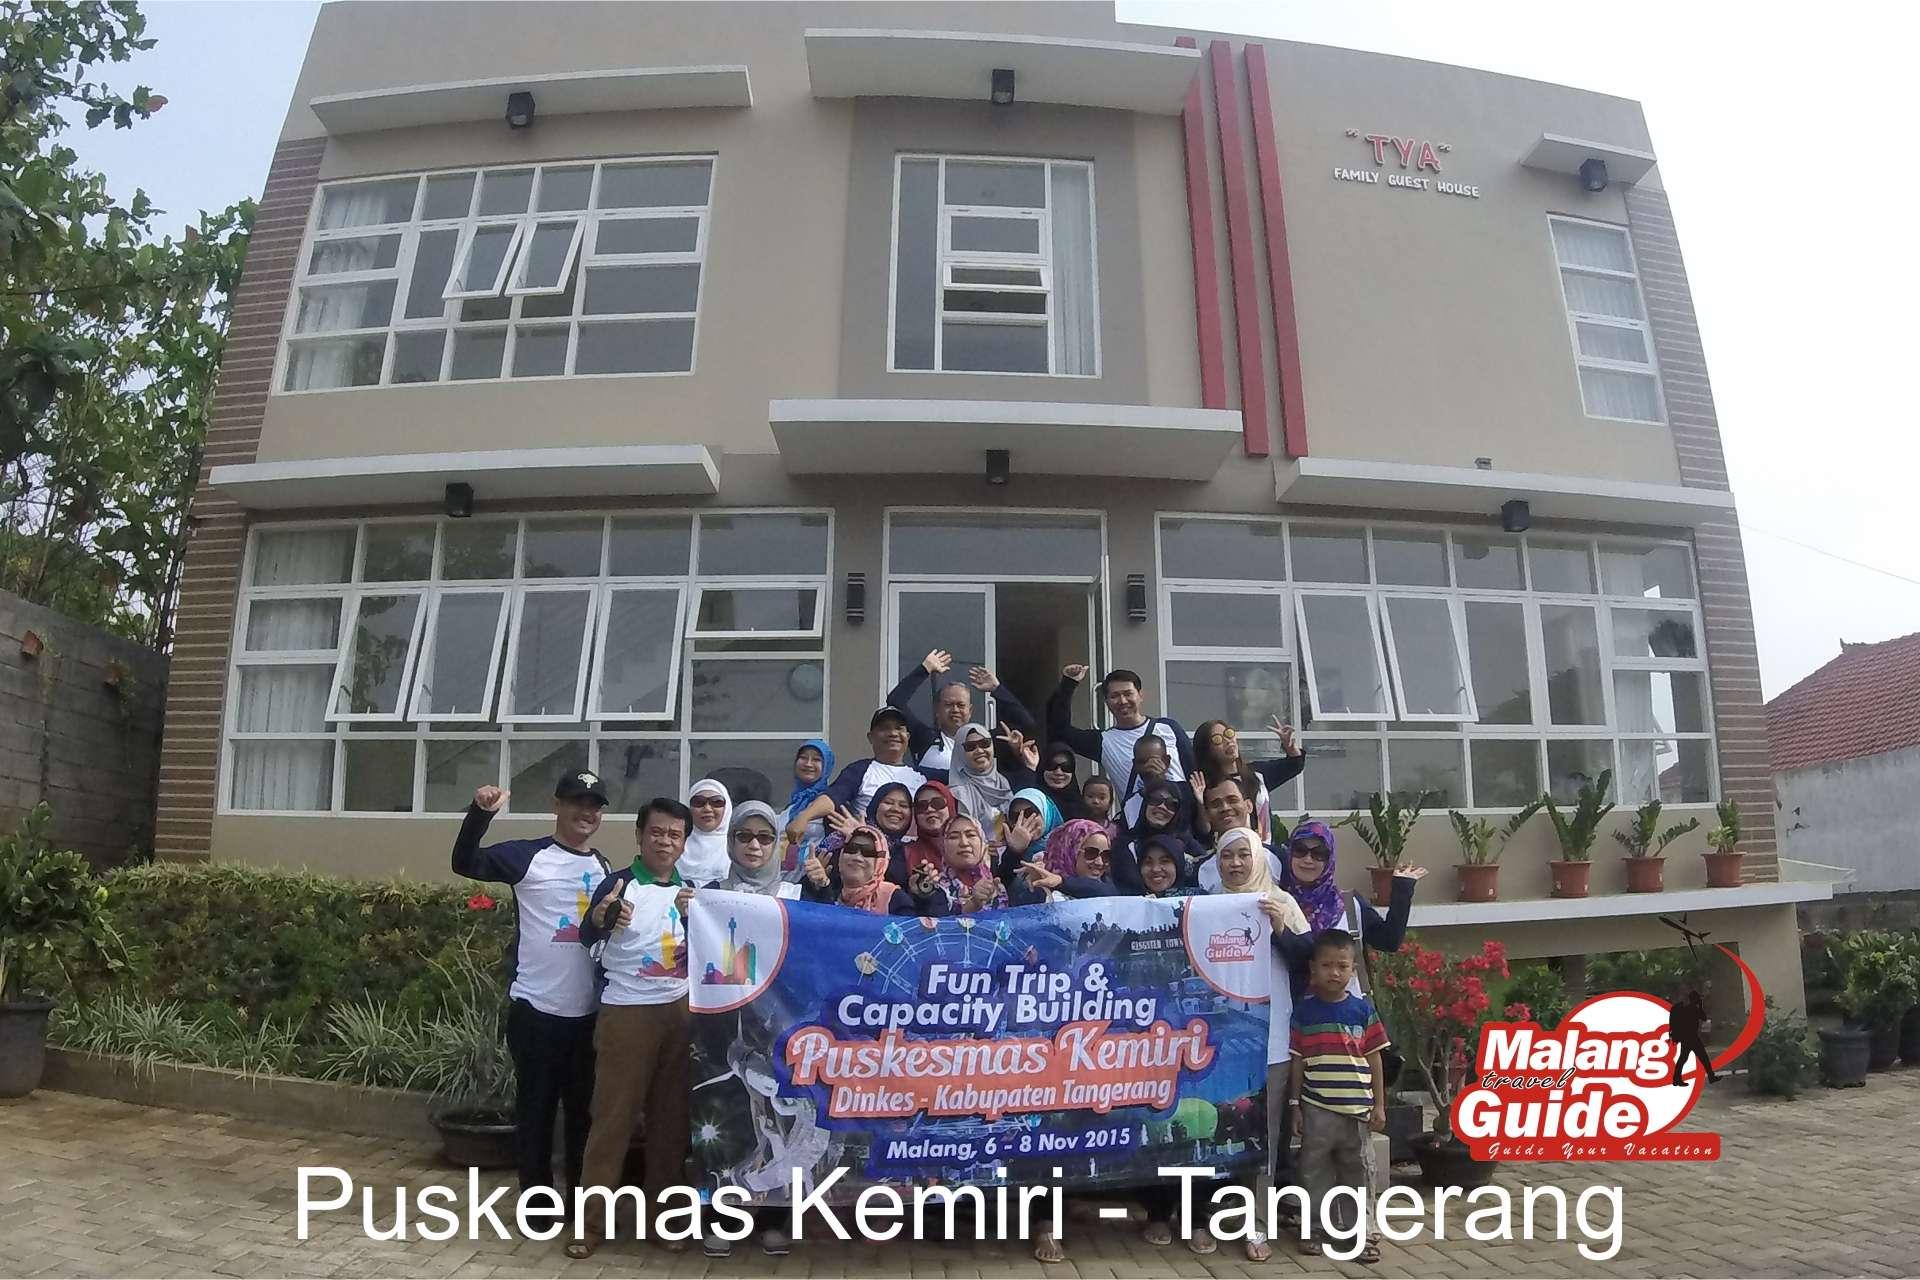 Malang Travel Guide Tour And Organizer Malang Jawa Timur